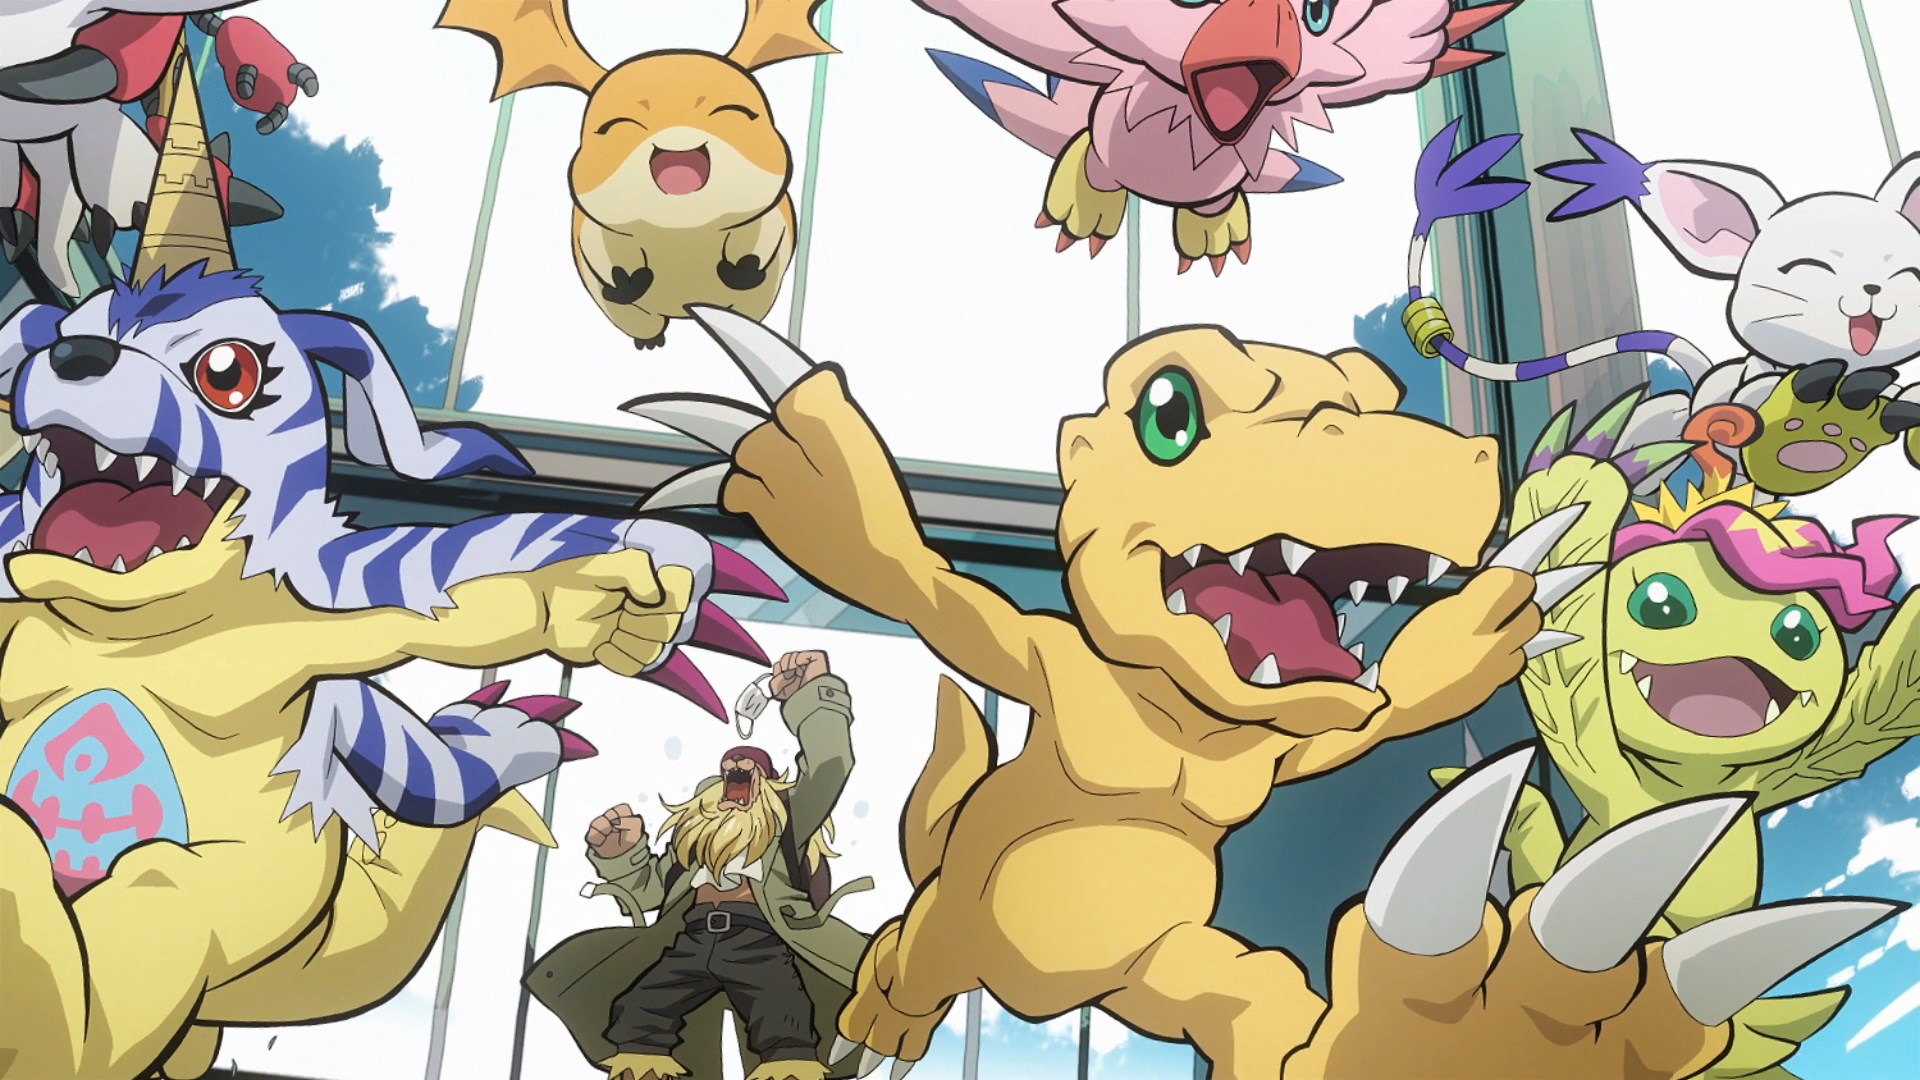 Digimon 02 capitulo 32 latino dating 7